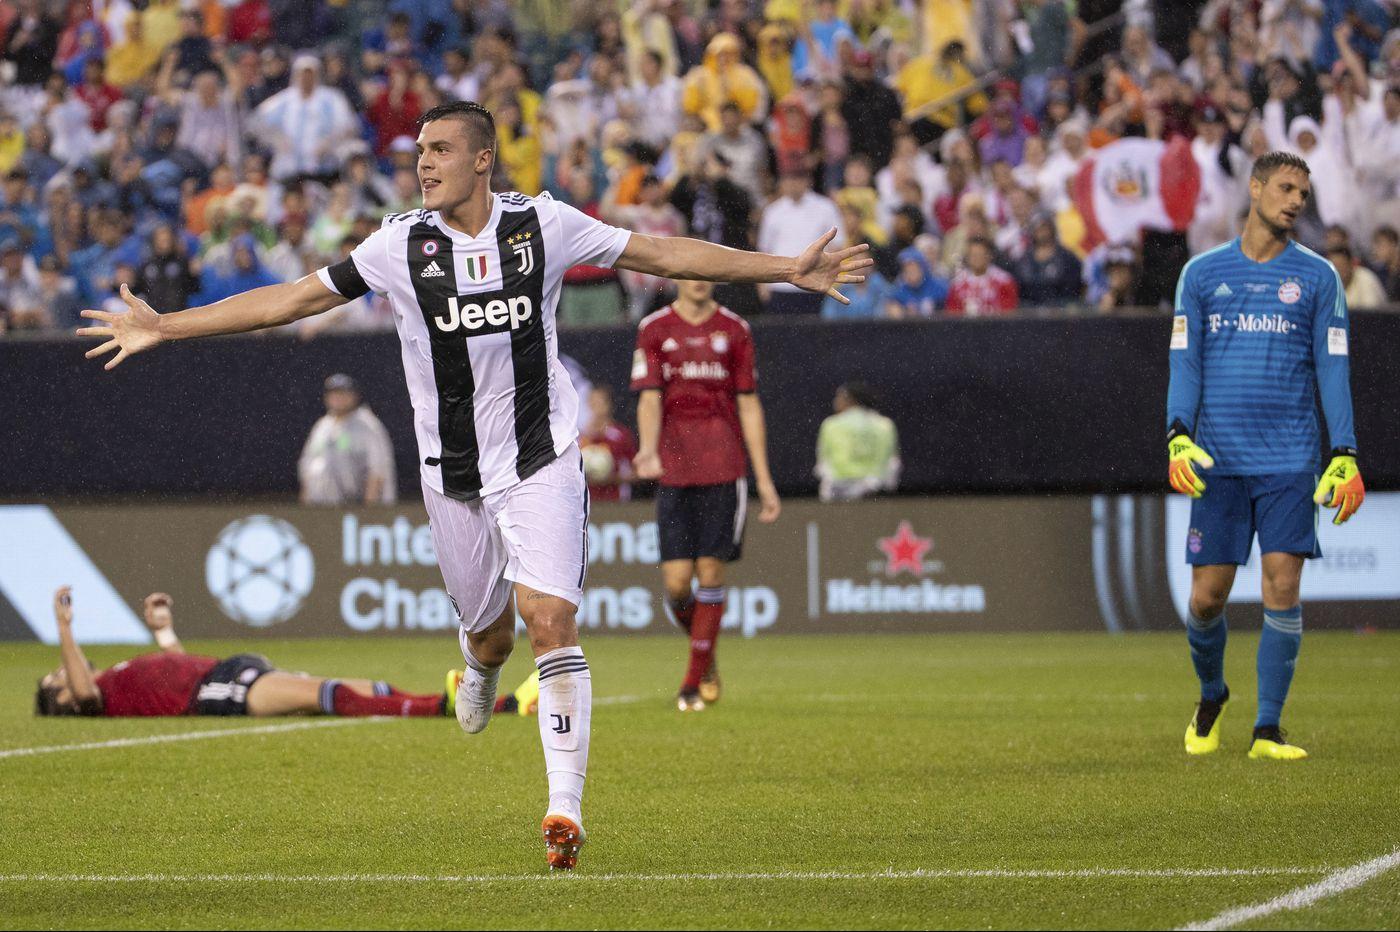 Juventus rides Andrea Favilli brace to beat Bayern Munich at Lincoln Financial Field